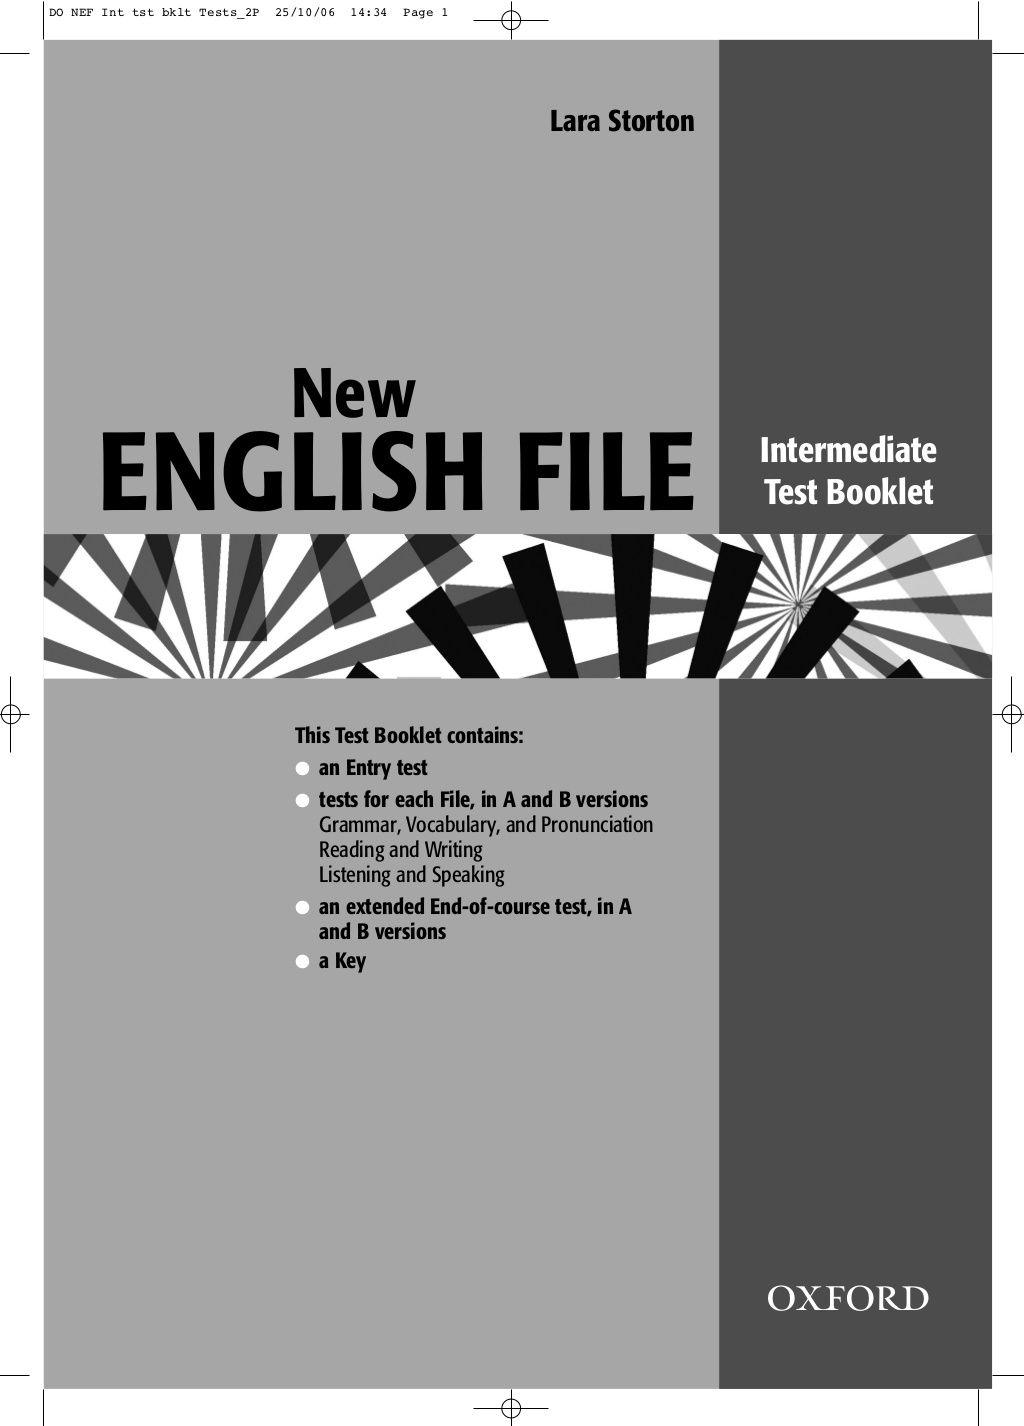 New English File Intermediate Tests Oxford Exam Advanced Vocabulary Reading Comprehension 2nd O Libro Ingles Ingles Para Principiantes Actividades De Ingles